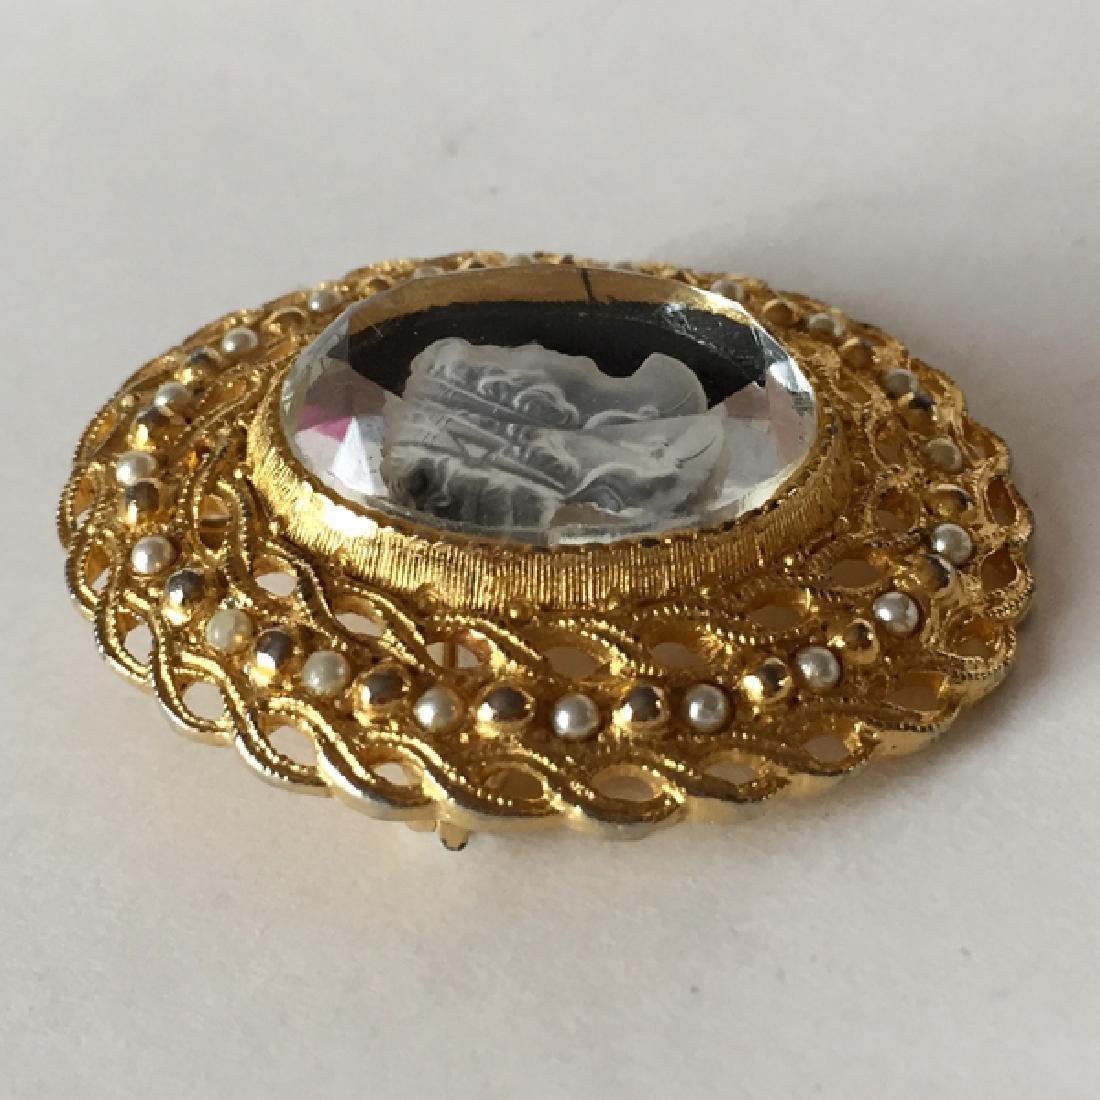 Vintage gold tone textured base embellished with white - 3